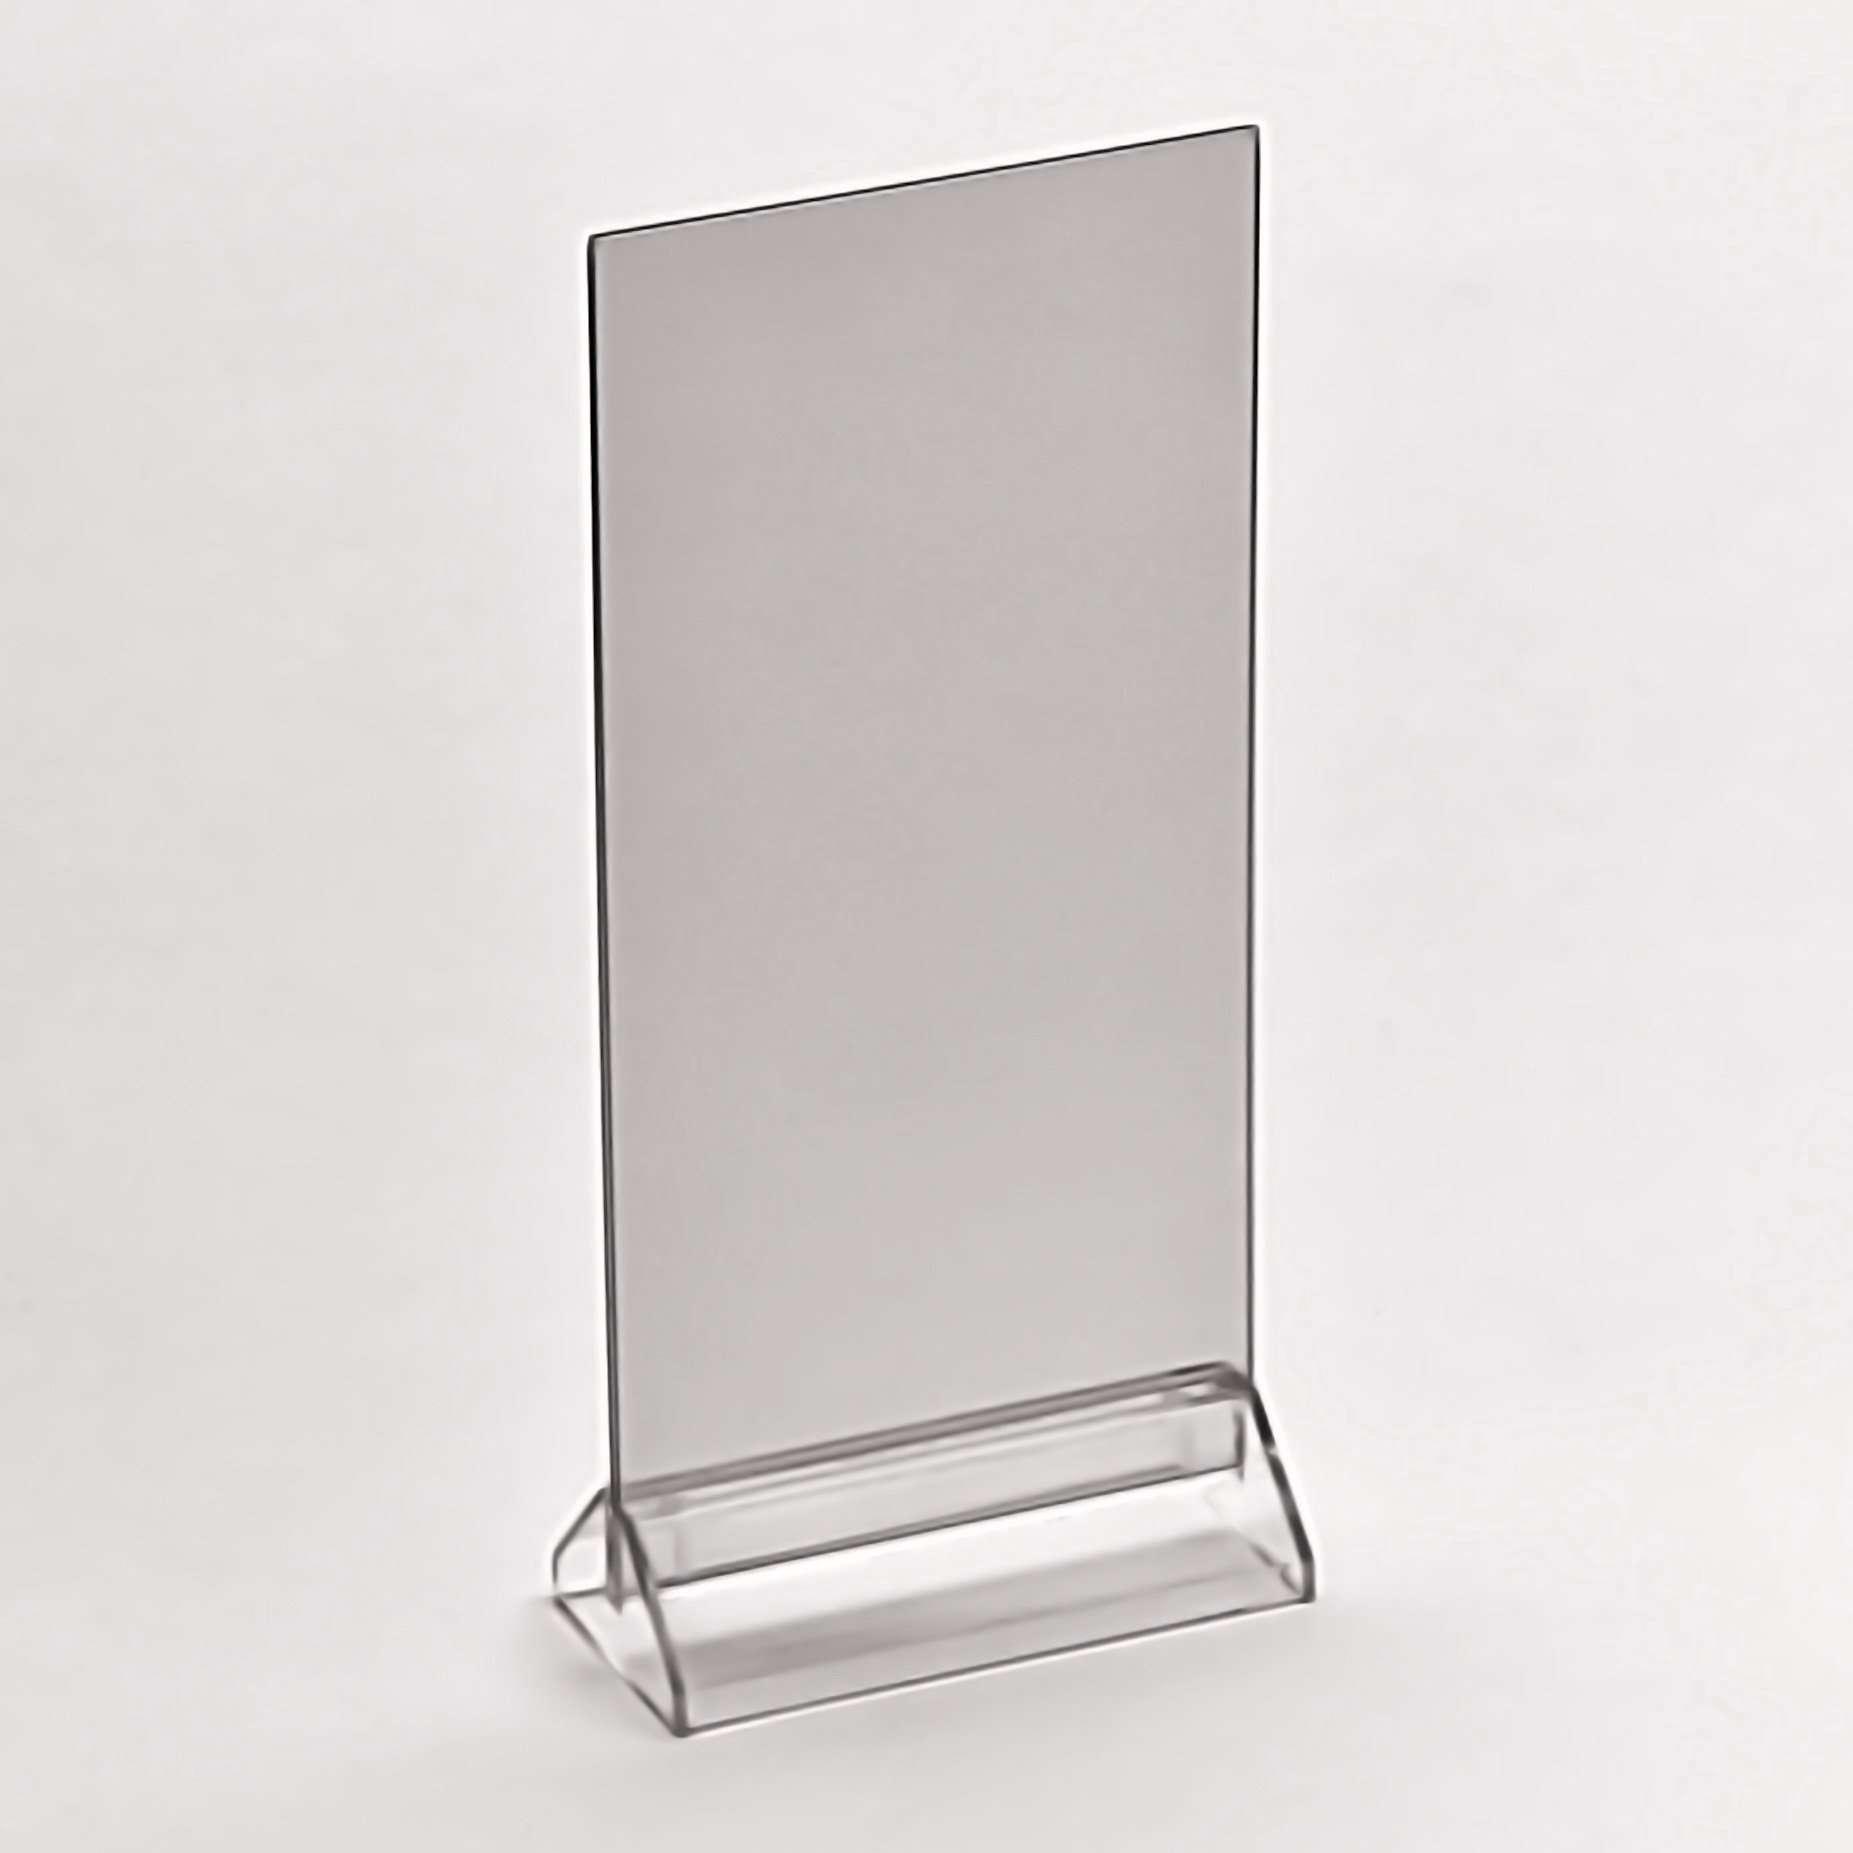 Led Edge Lit Signage How To Make A Mirror Acrylic Led Edge